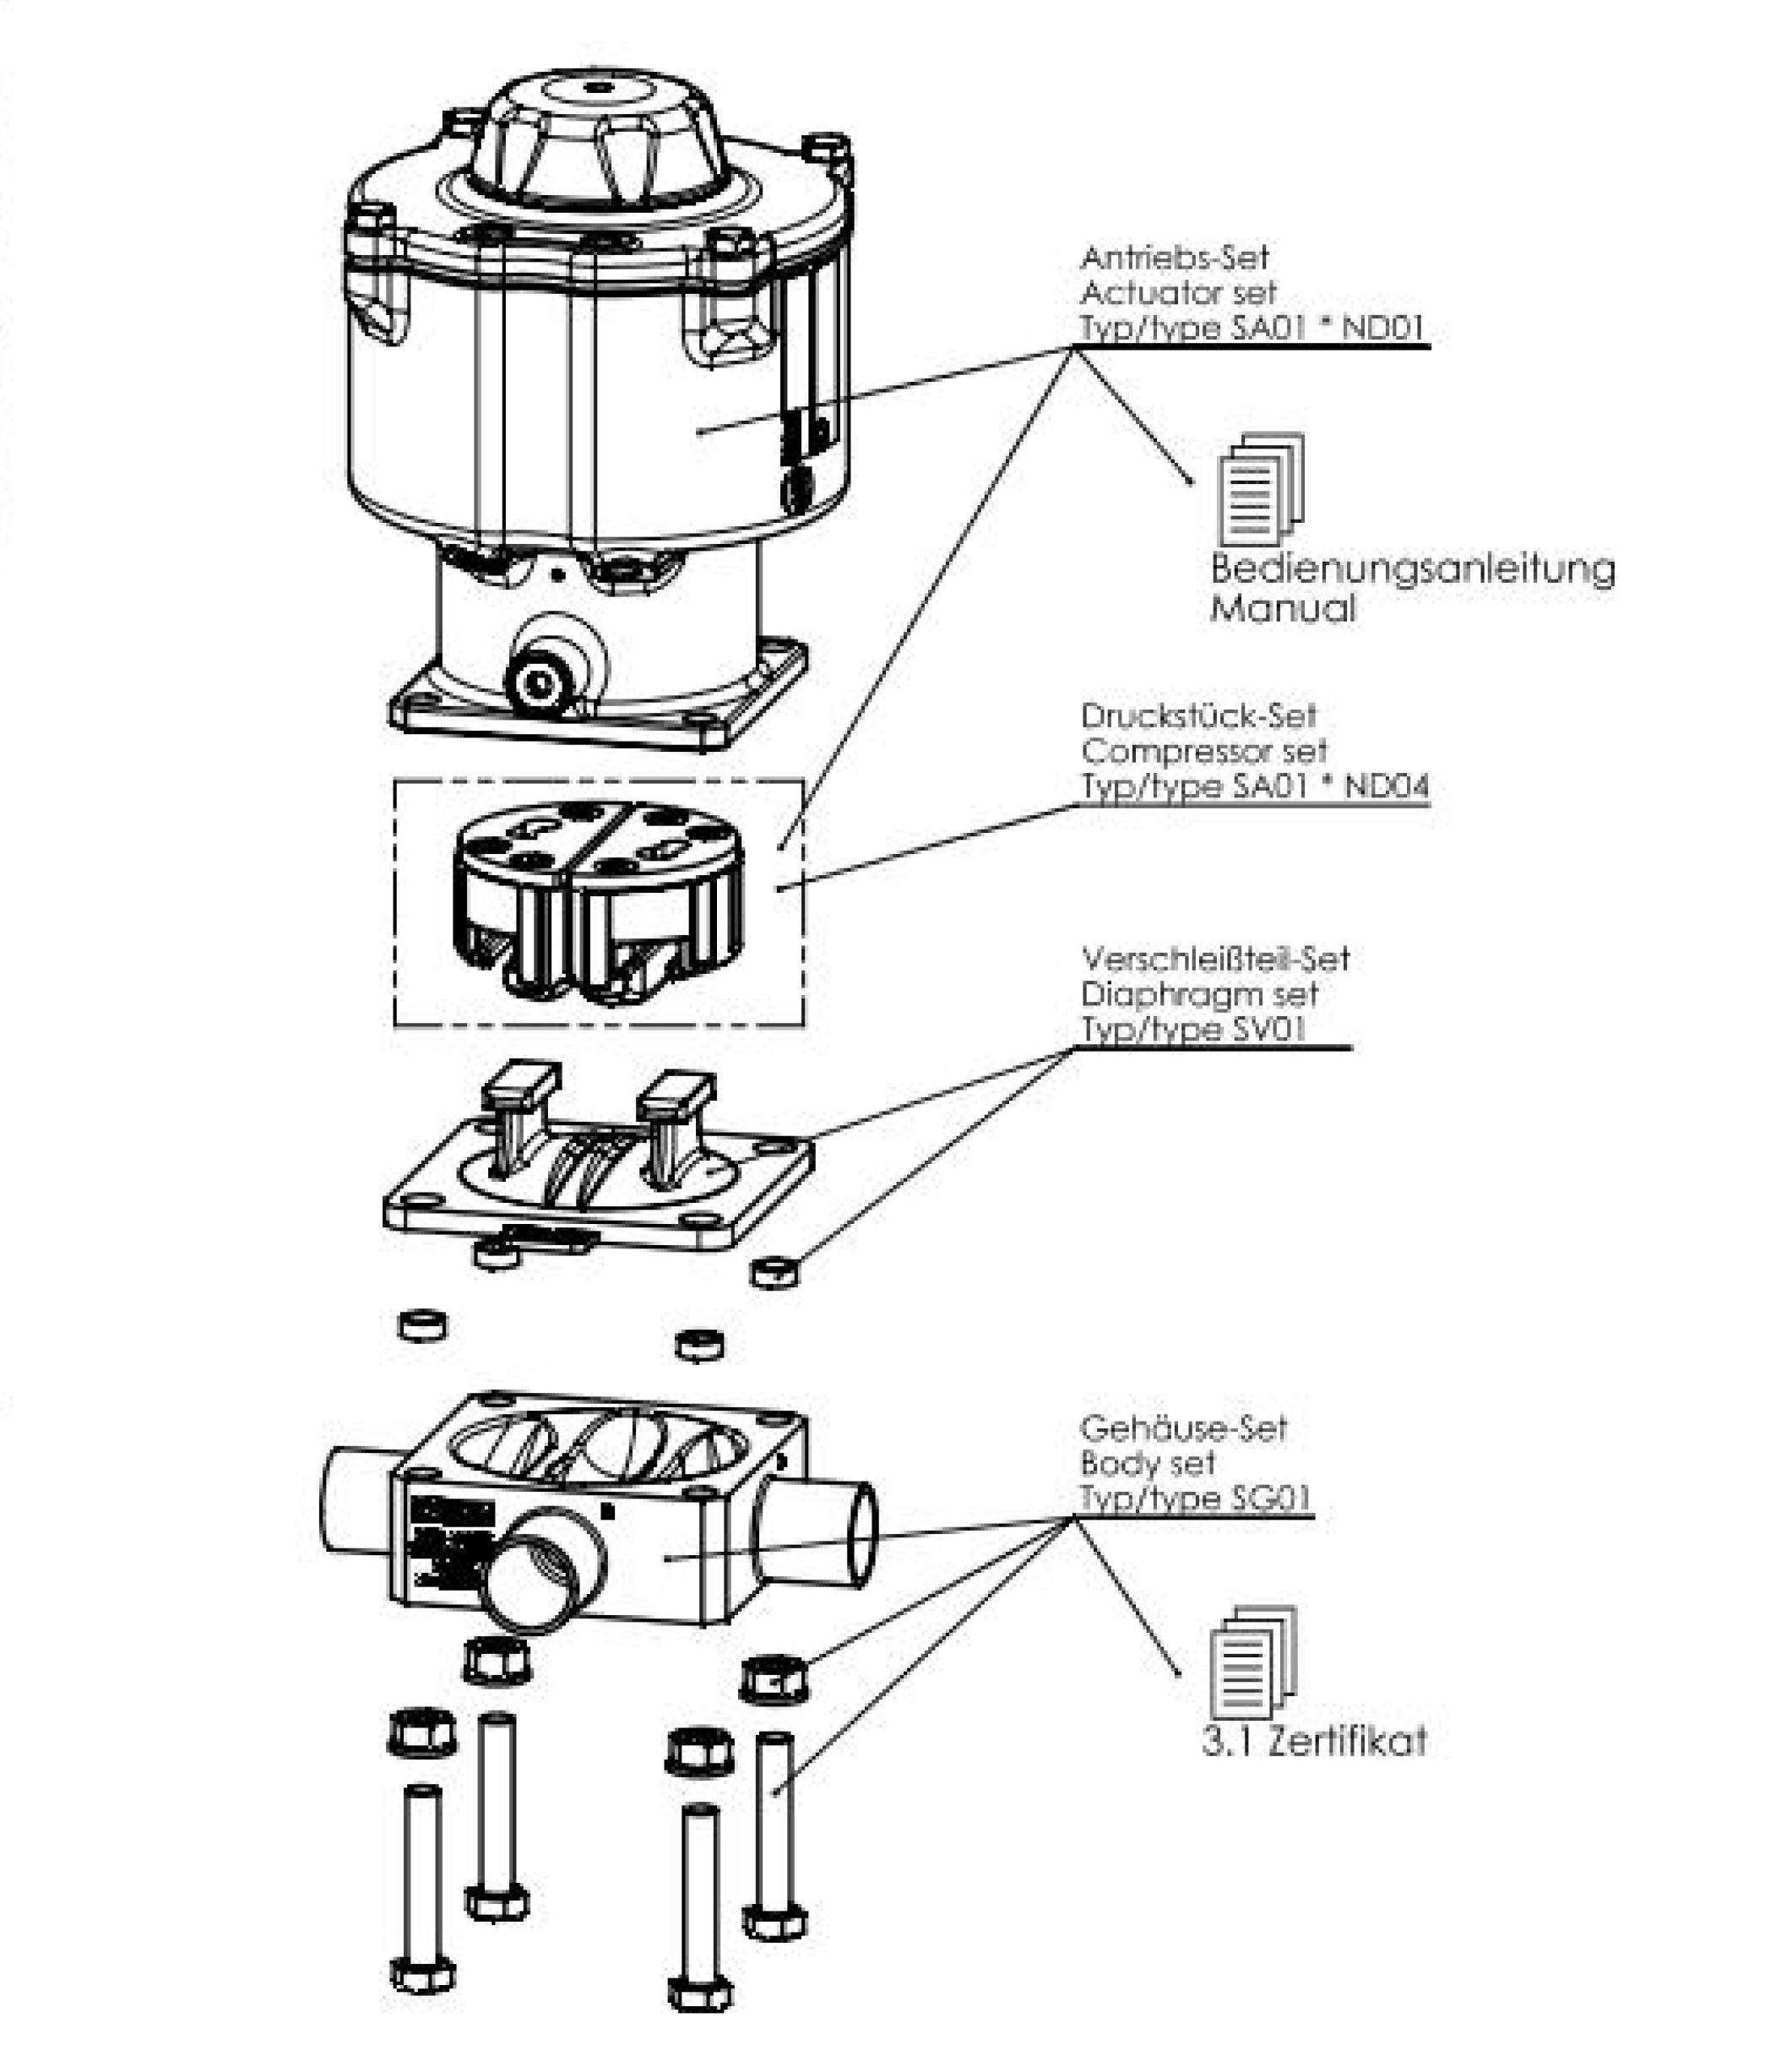 Type 2036 Robolux Multiway Multiport Diaphragm Valve Block Diagram Jpeg Compression 9000201105jpeg